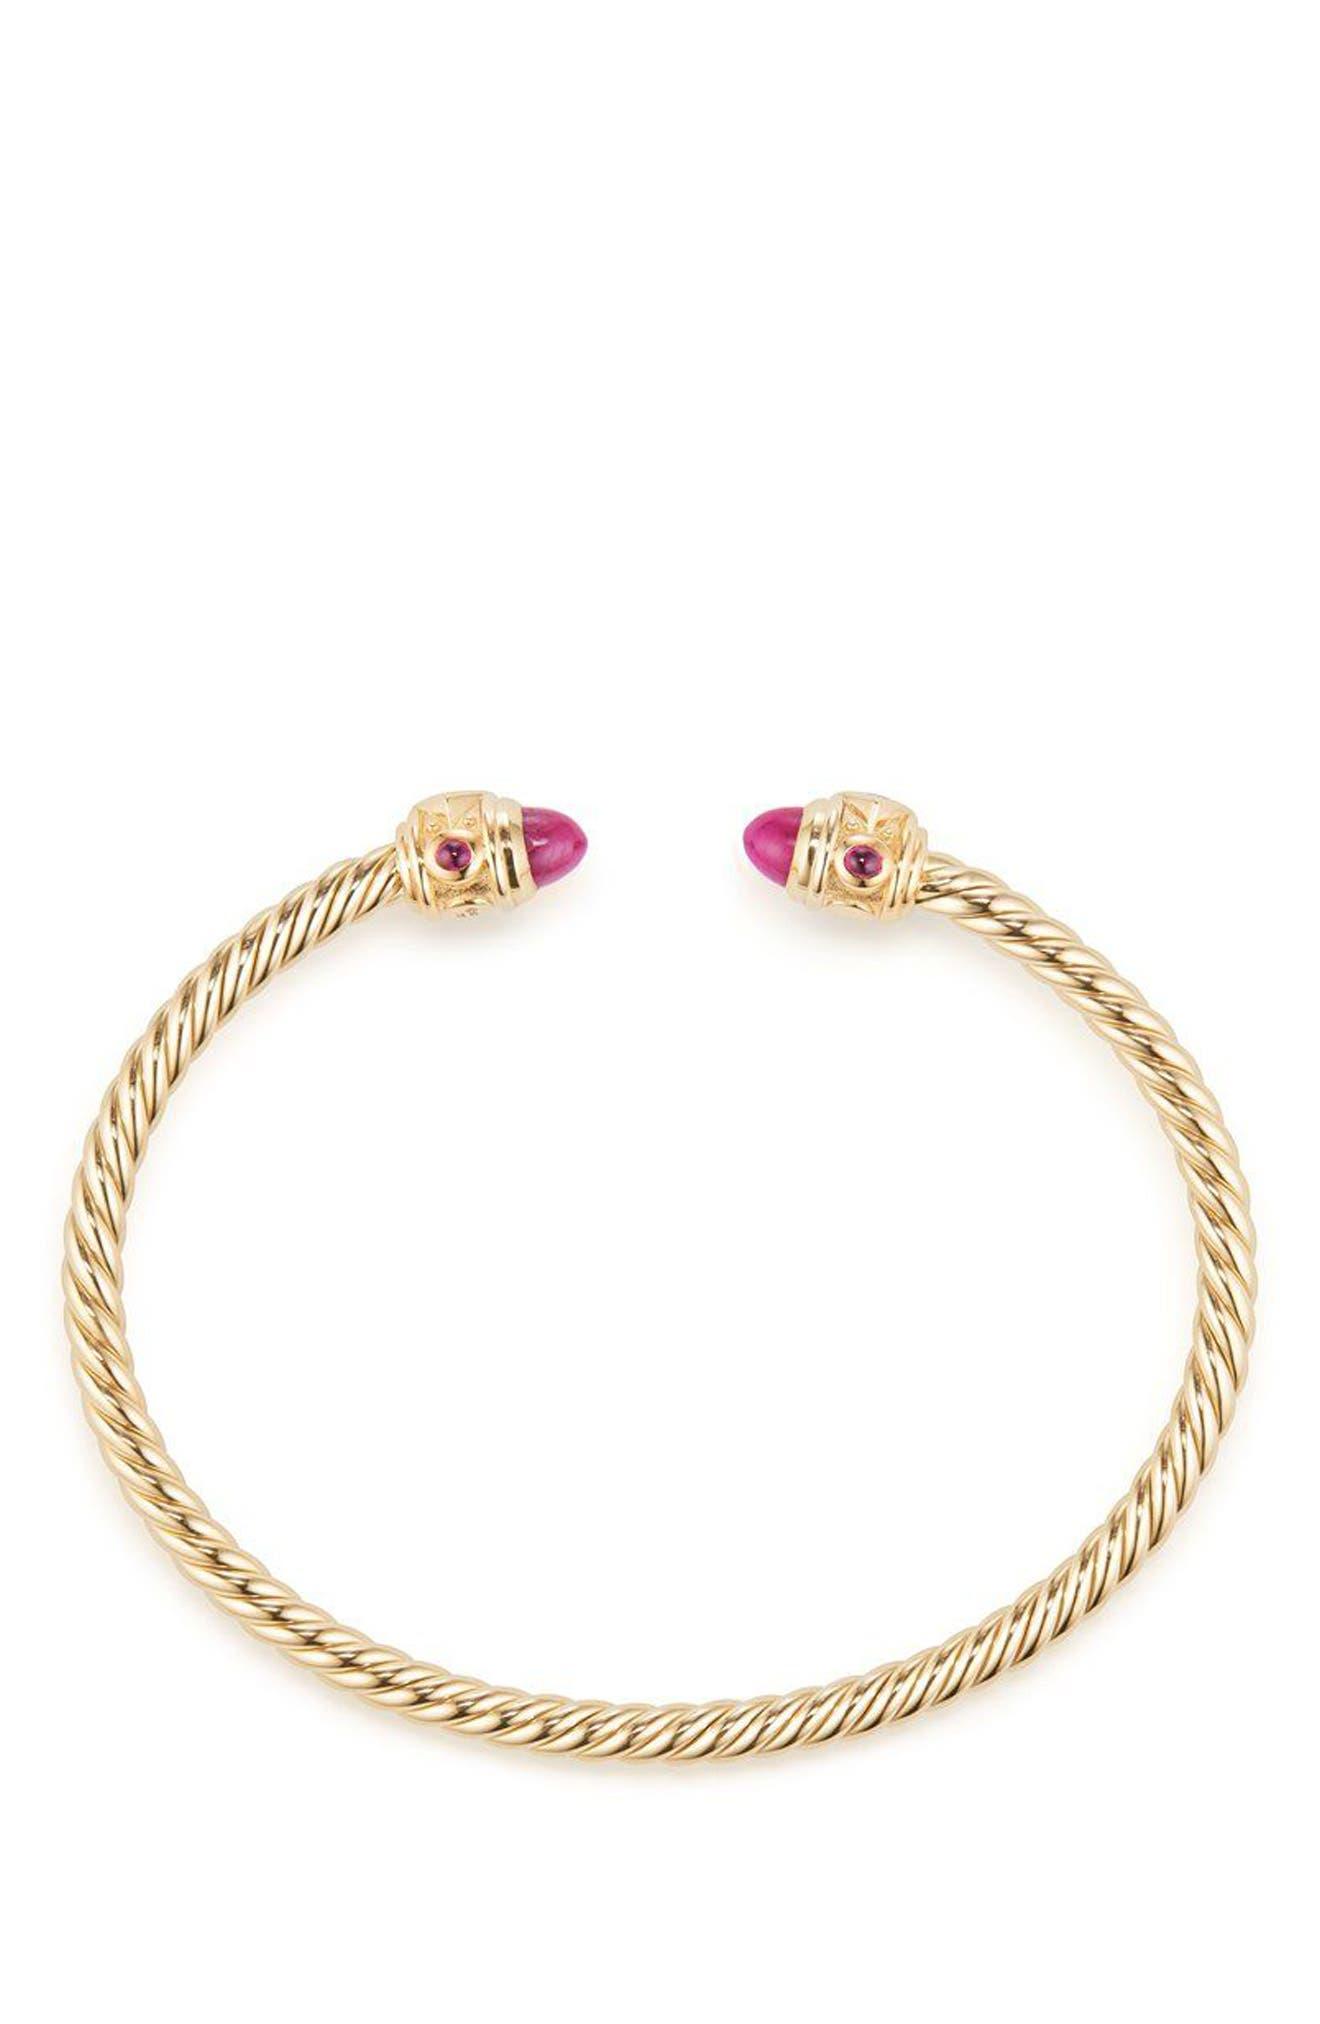 Renaissance Bracelet in 18K Gold, 3.5mm,                             Alternate thumbnail 2, color,                             Gold/ Ruby